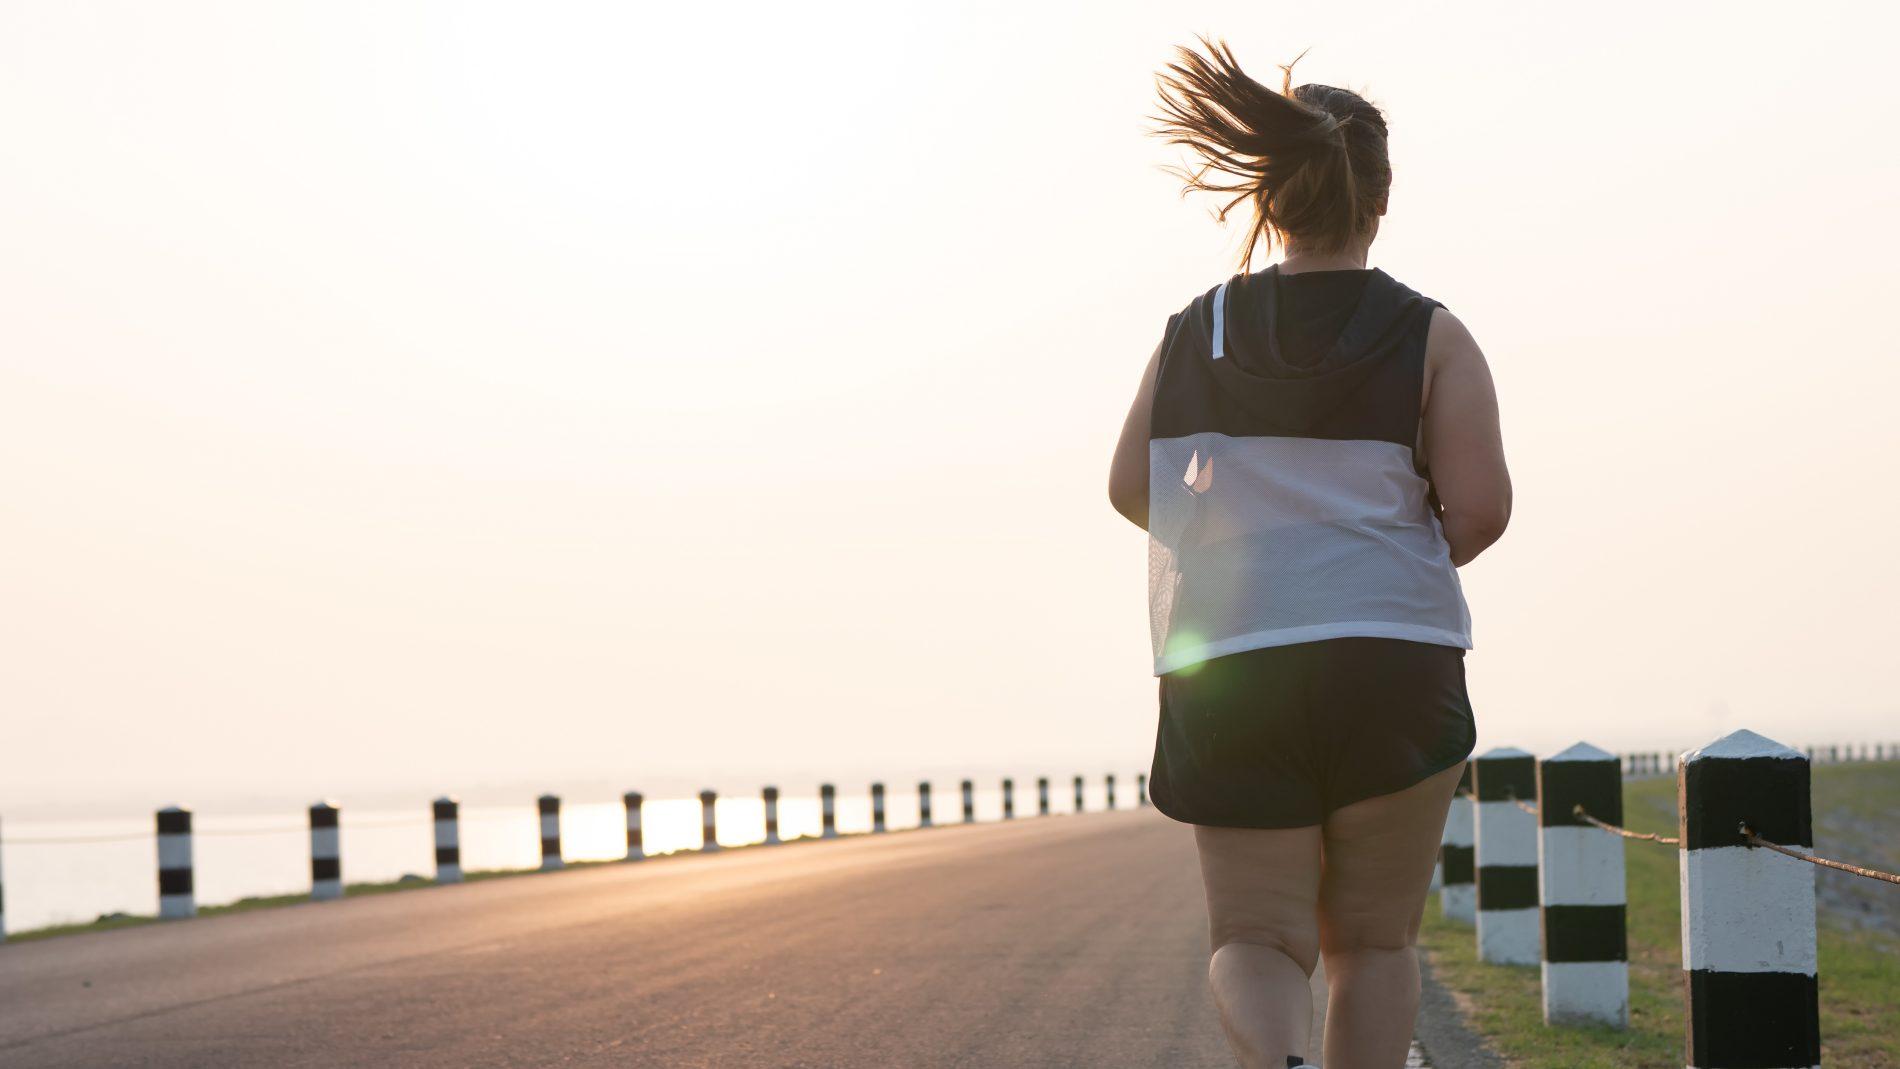 obesità e sport